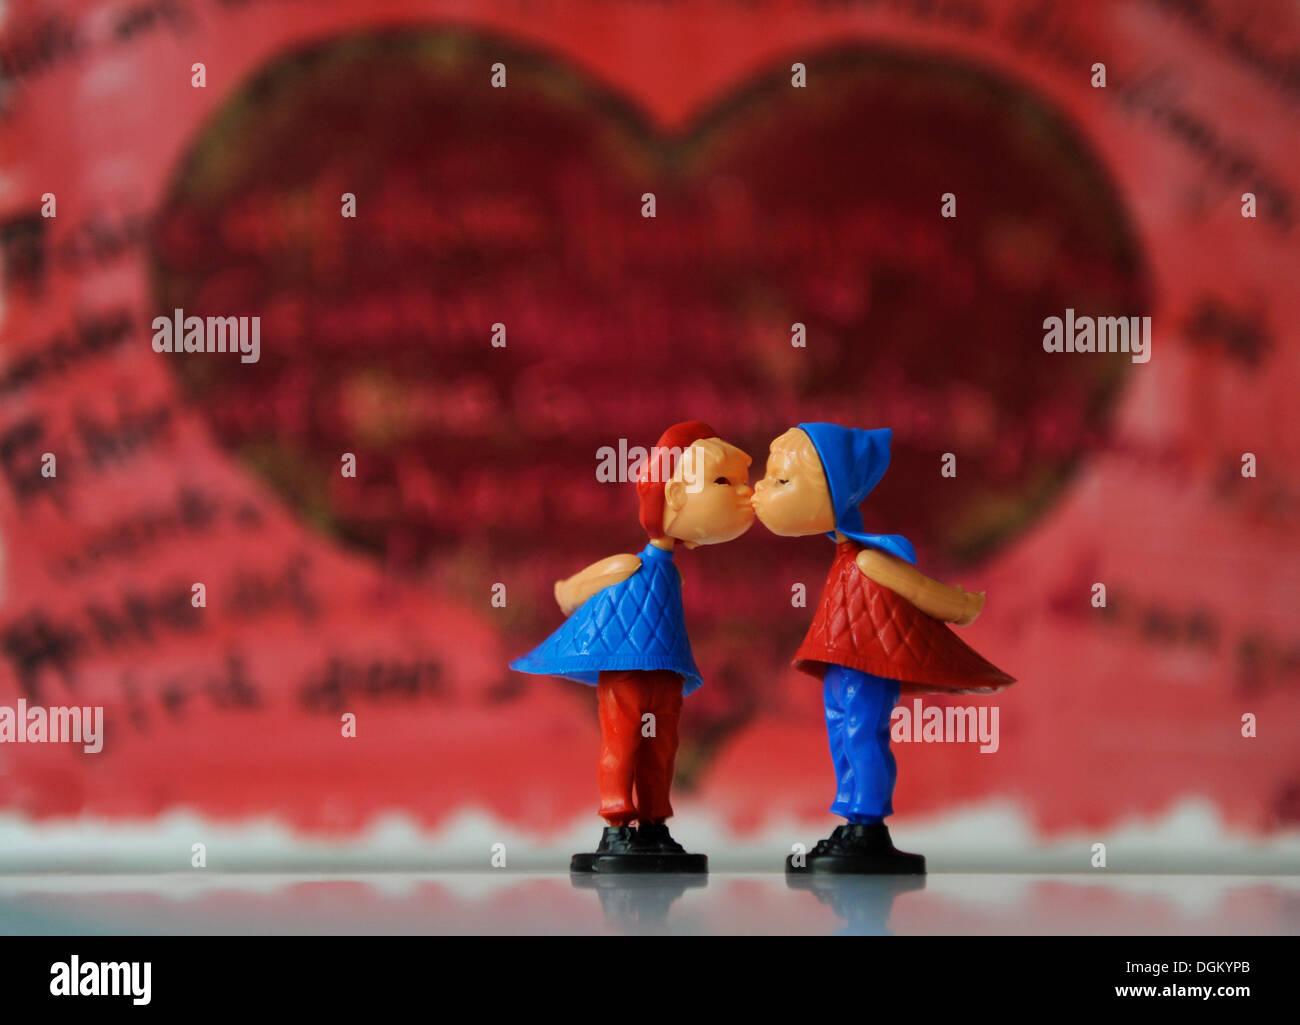 Kissing figures, symbolic image for love, partnership, marriage - Stock Image